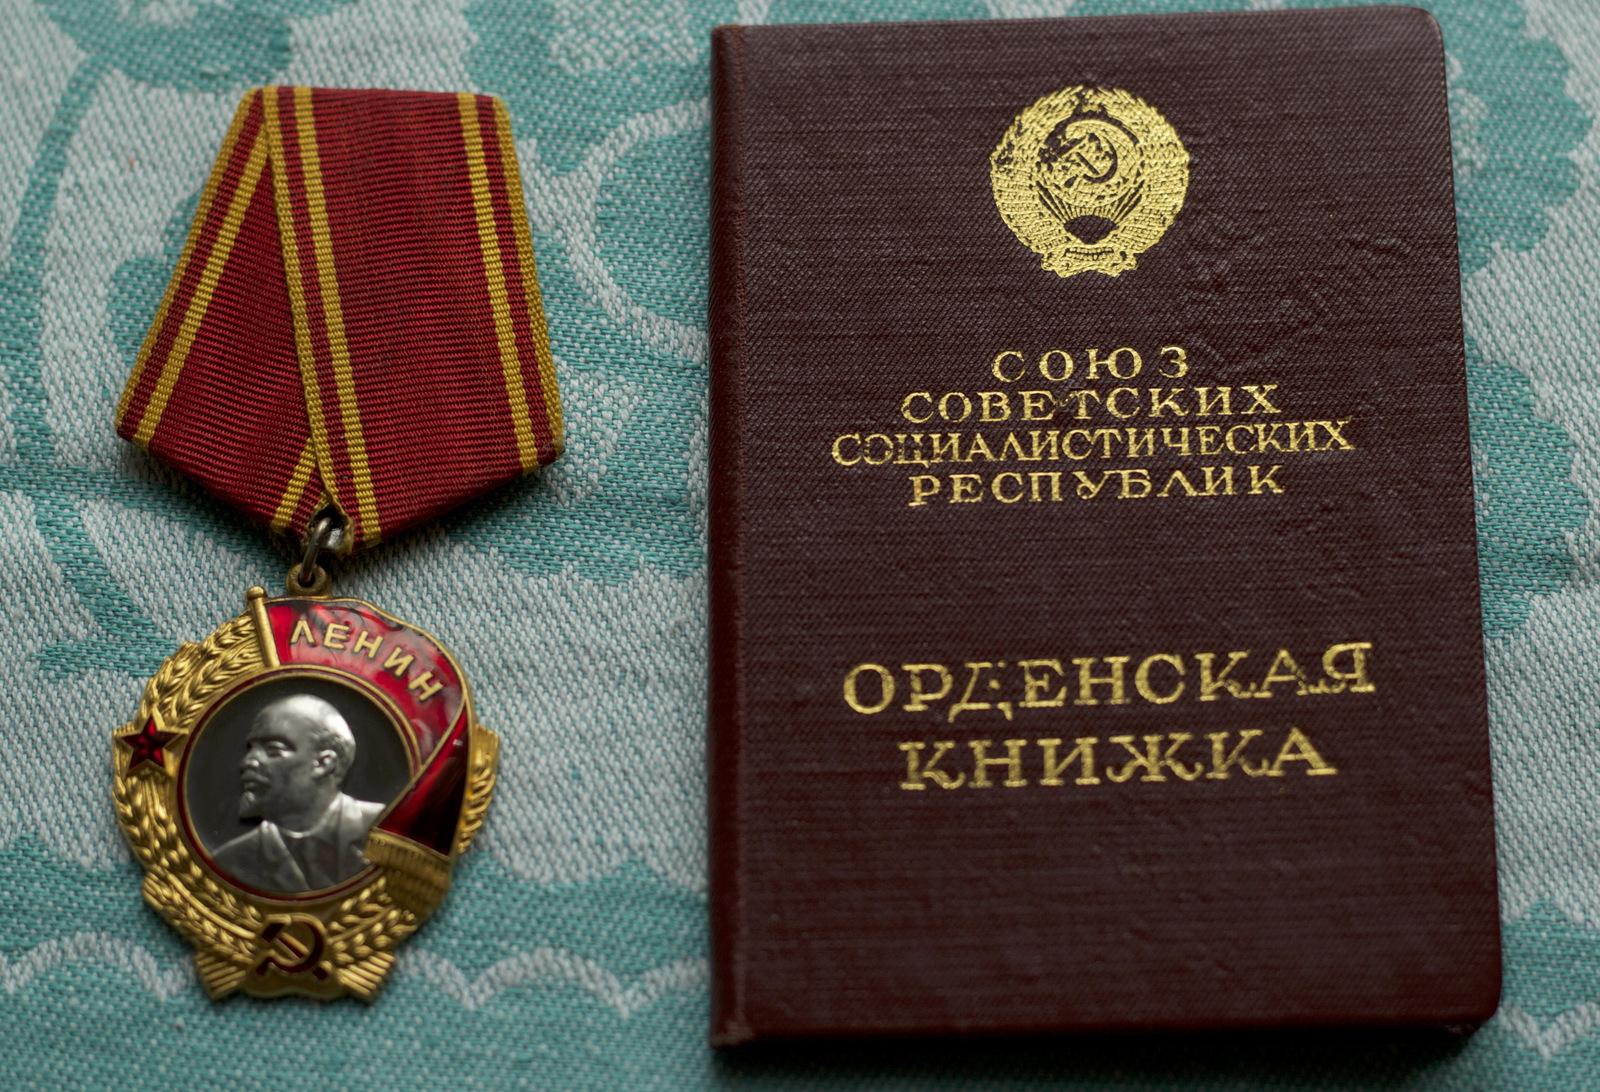 Lenin's medal and certificate book